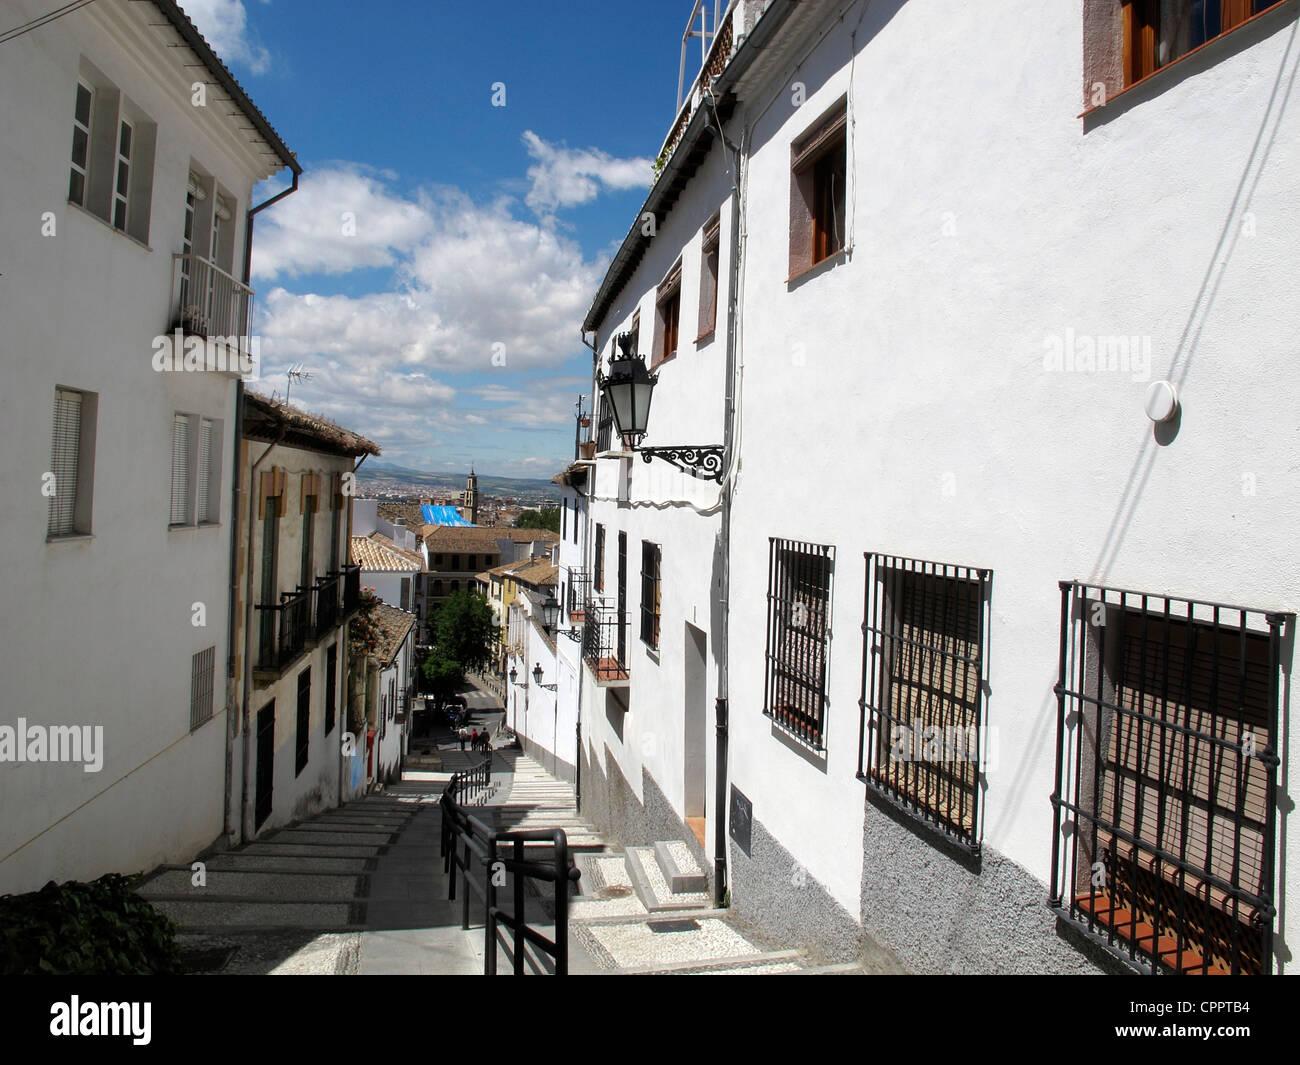 Spain Andalusia Granada The Albaycin The Moorish quarter Stock Photo